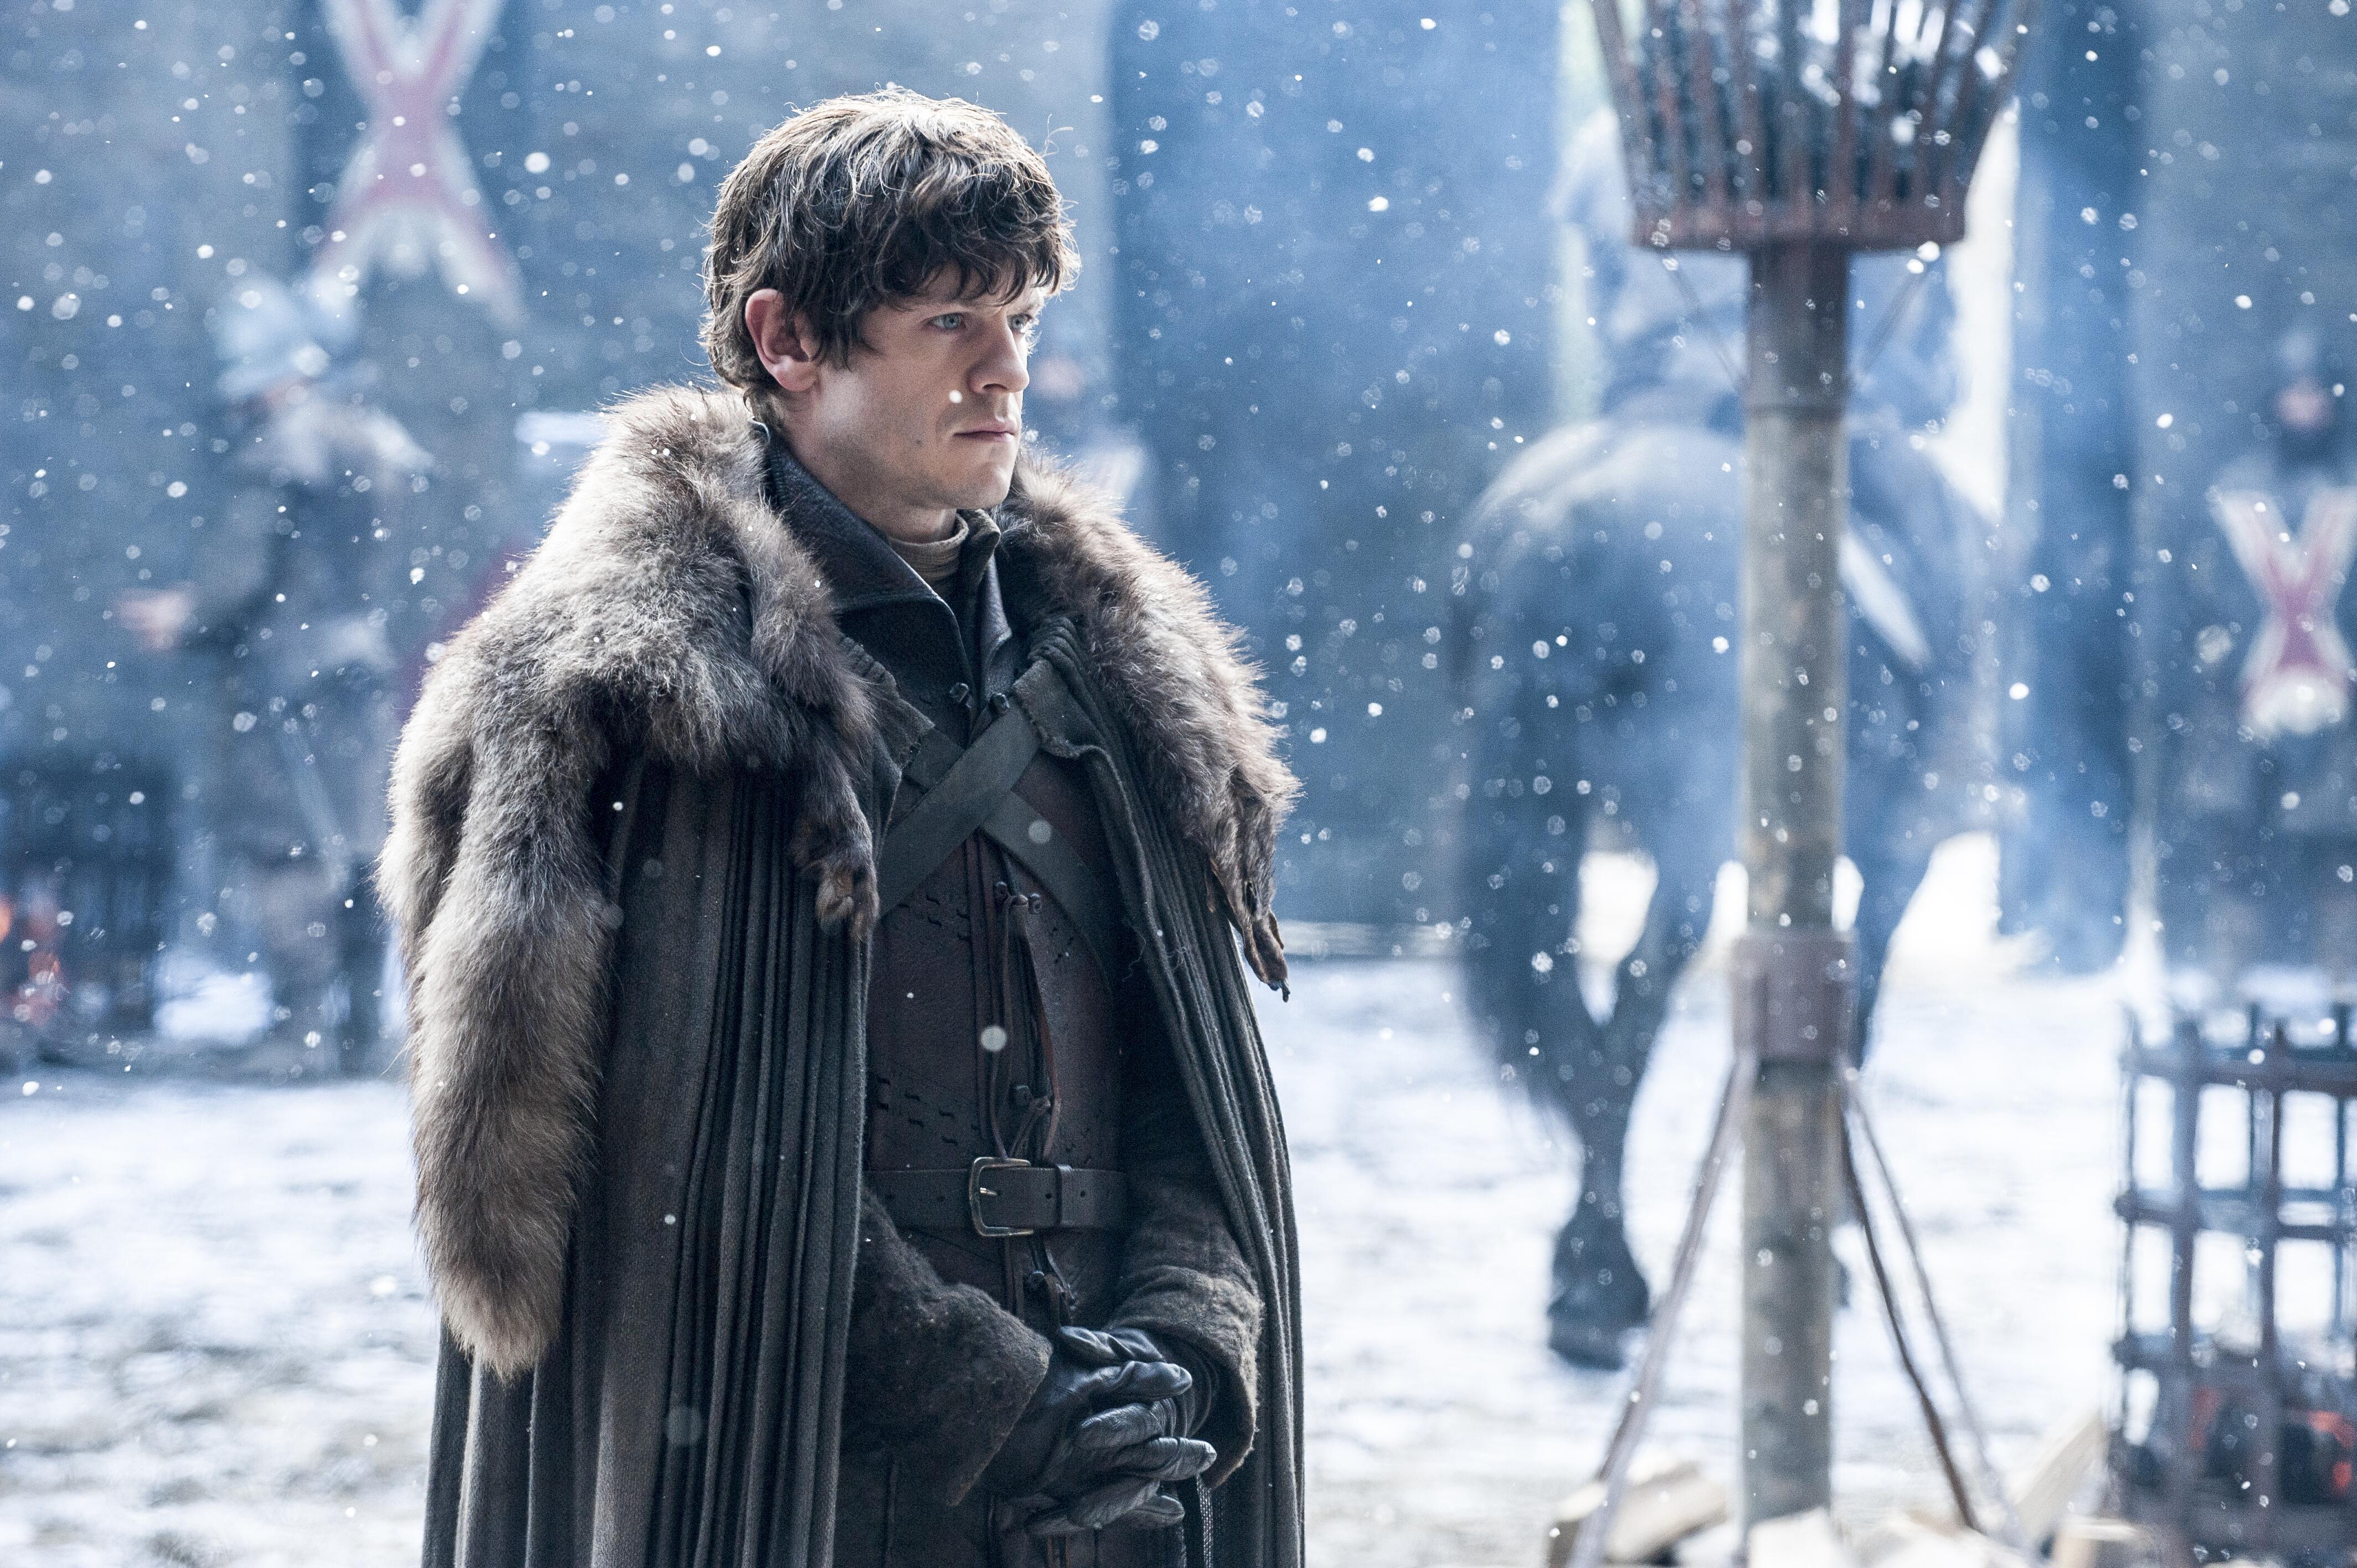 Bild zu Ramsay Bolton, Game of Thrones